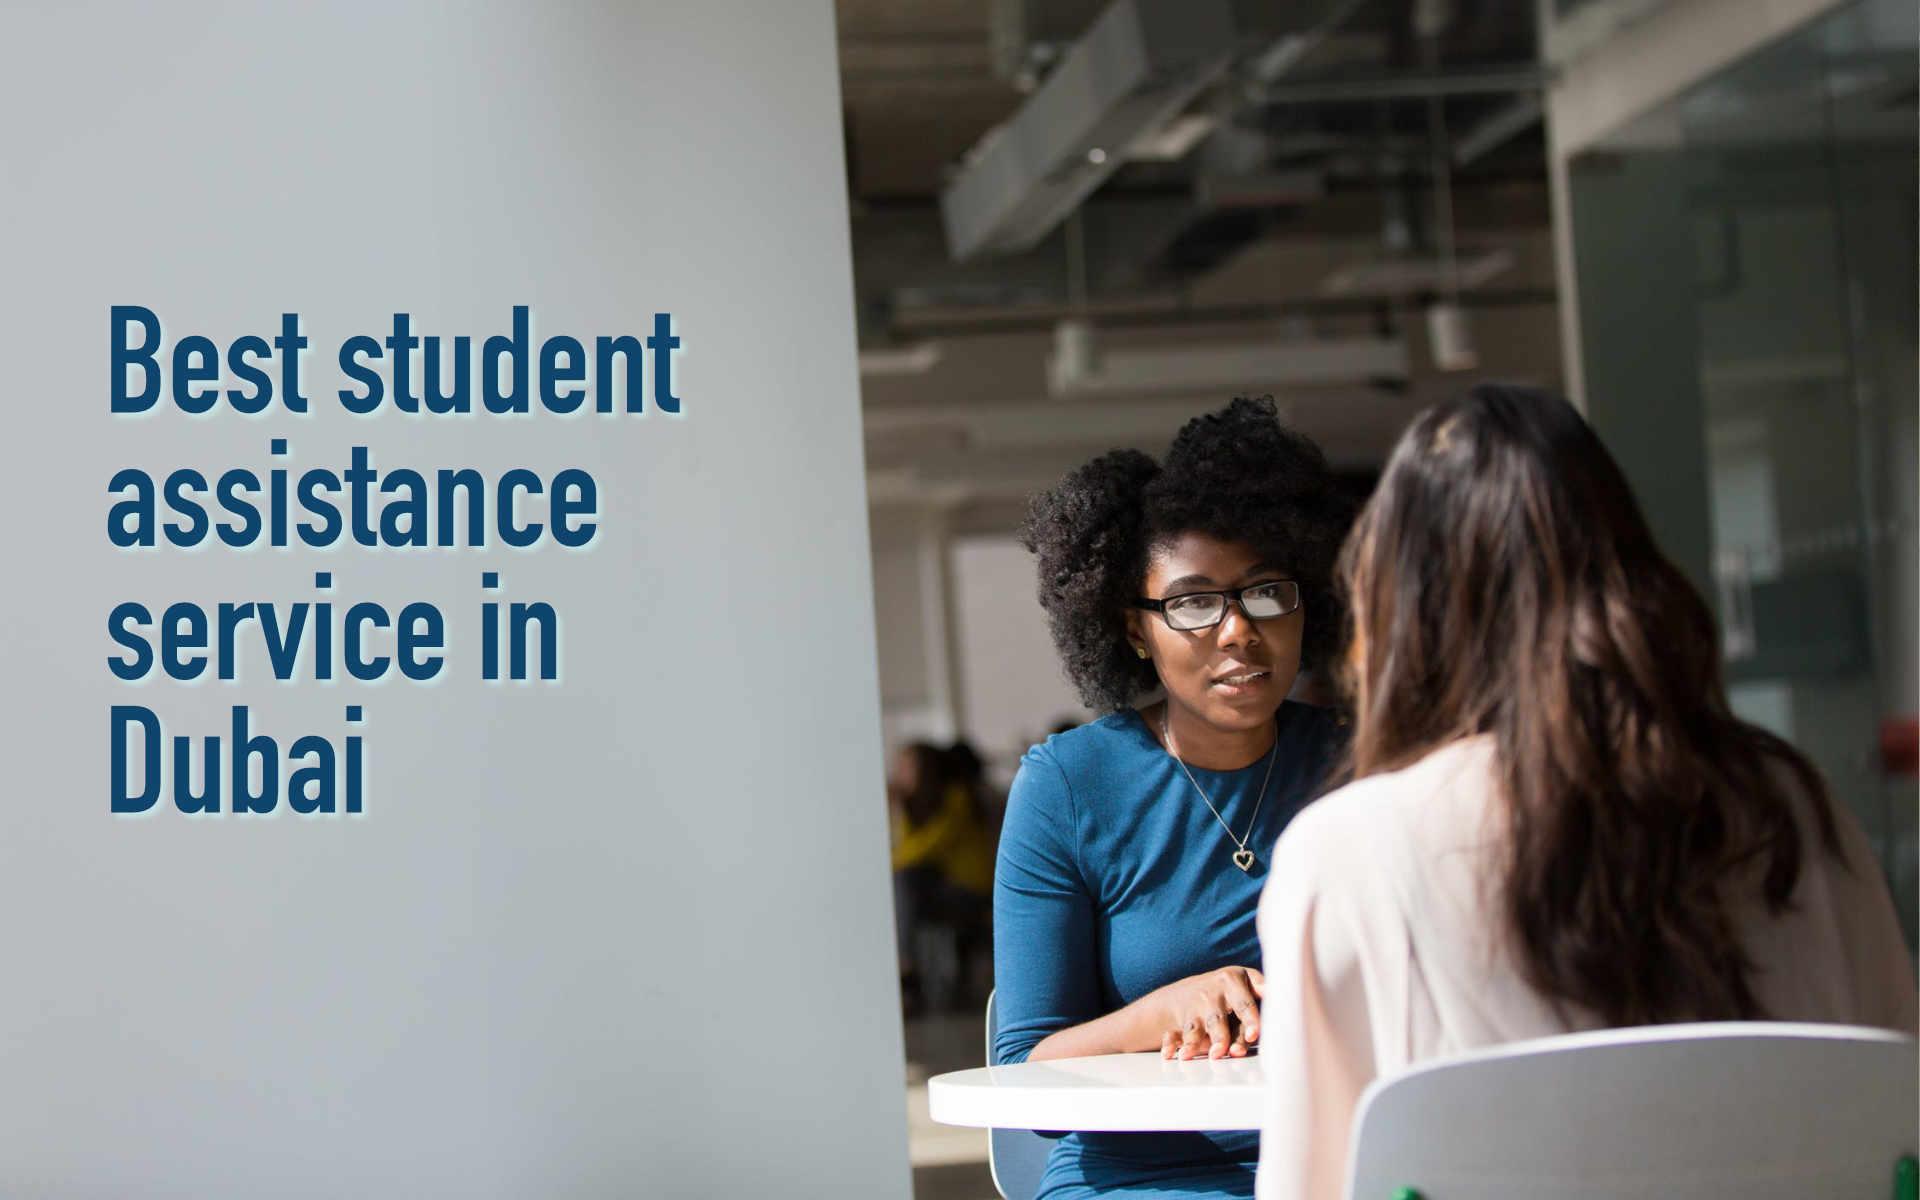 Best student assistance service in Dubai